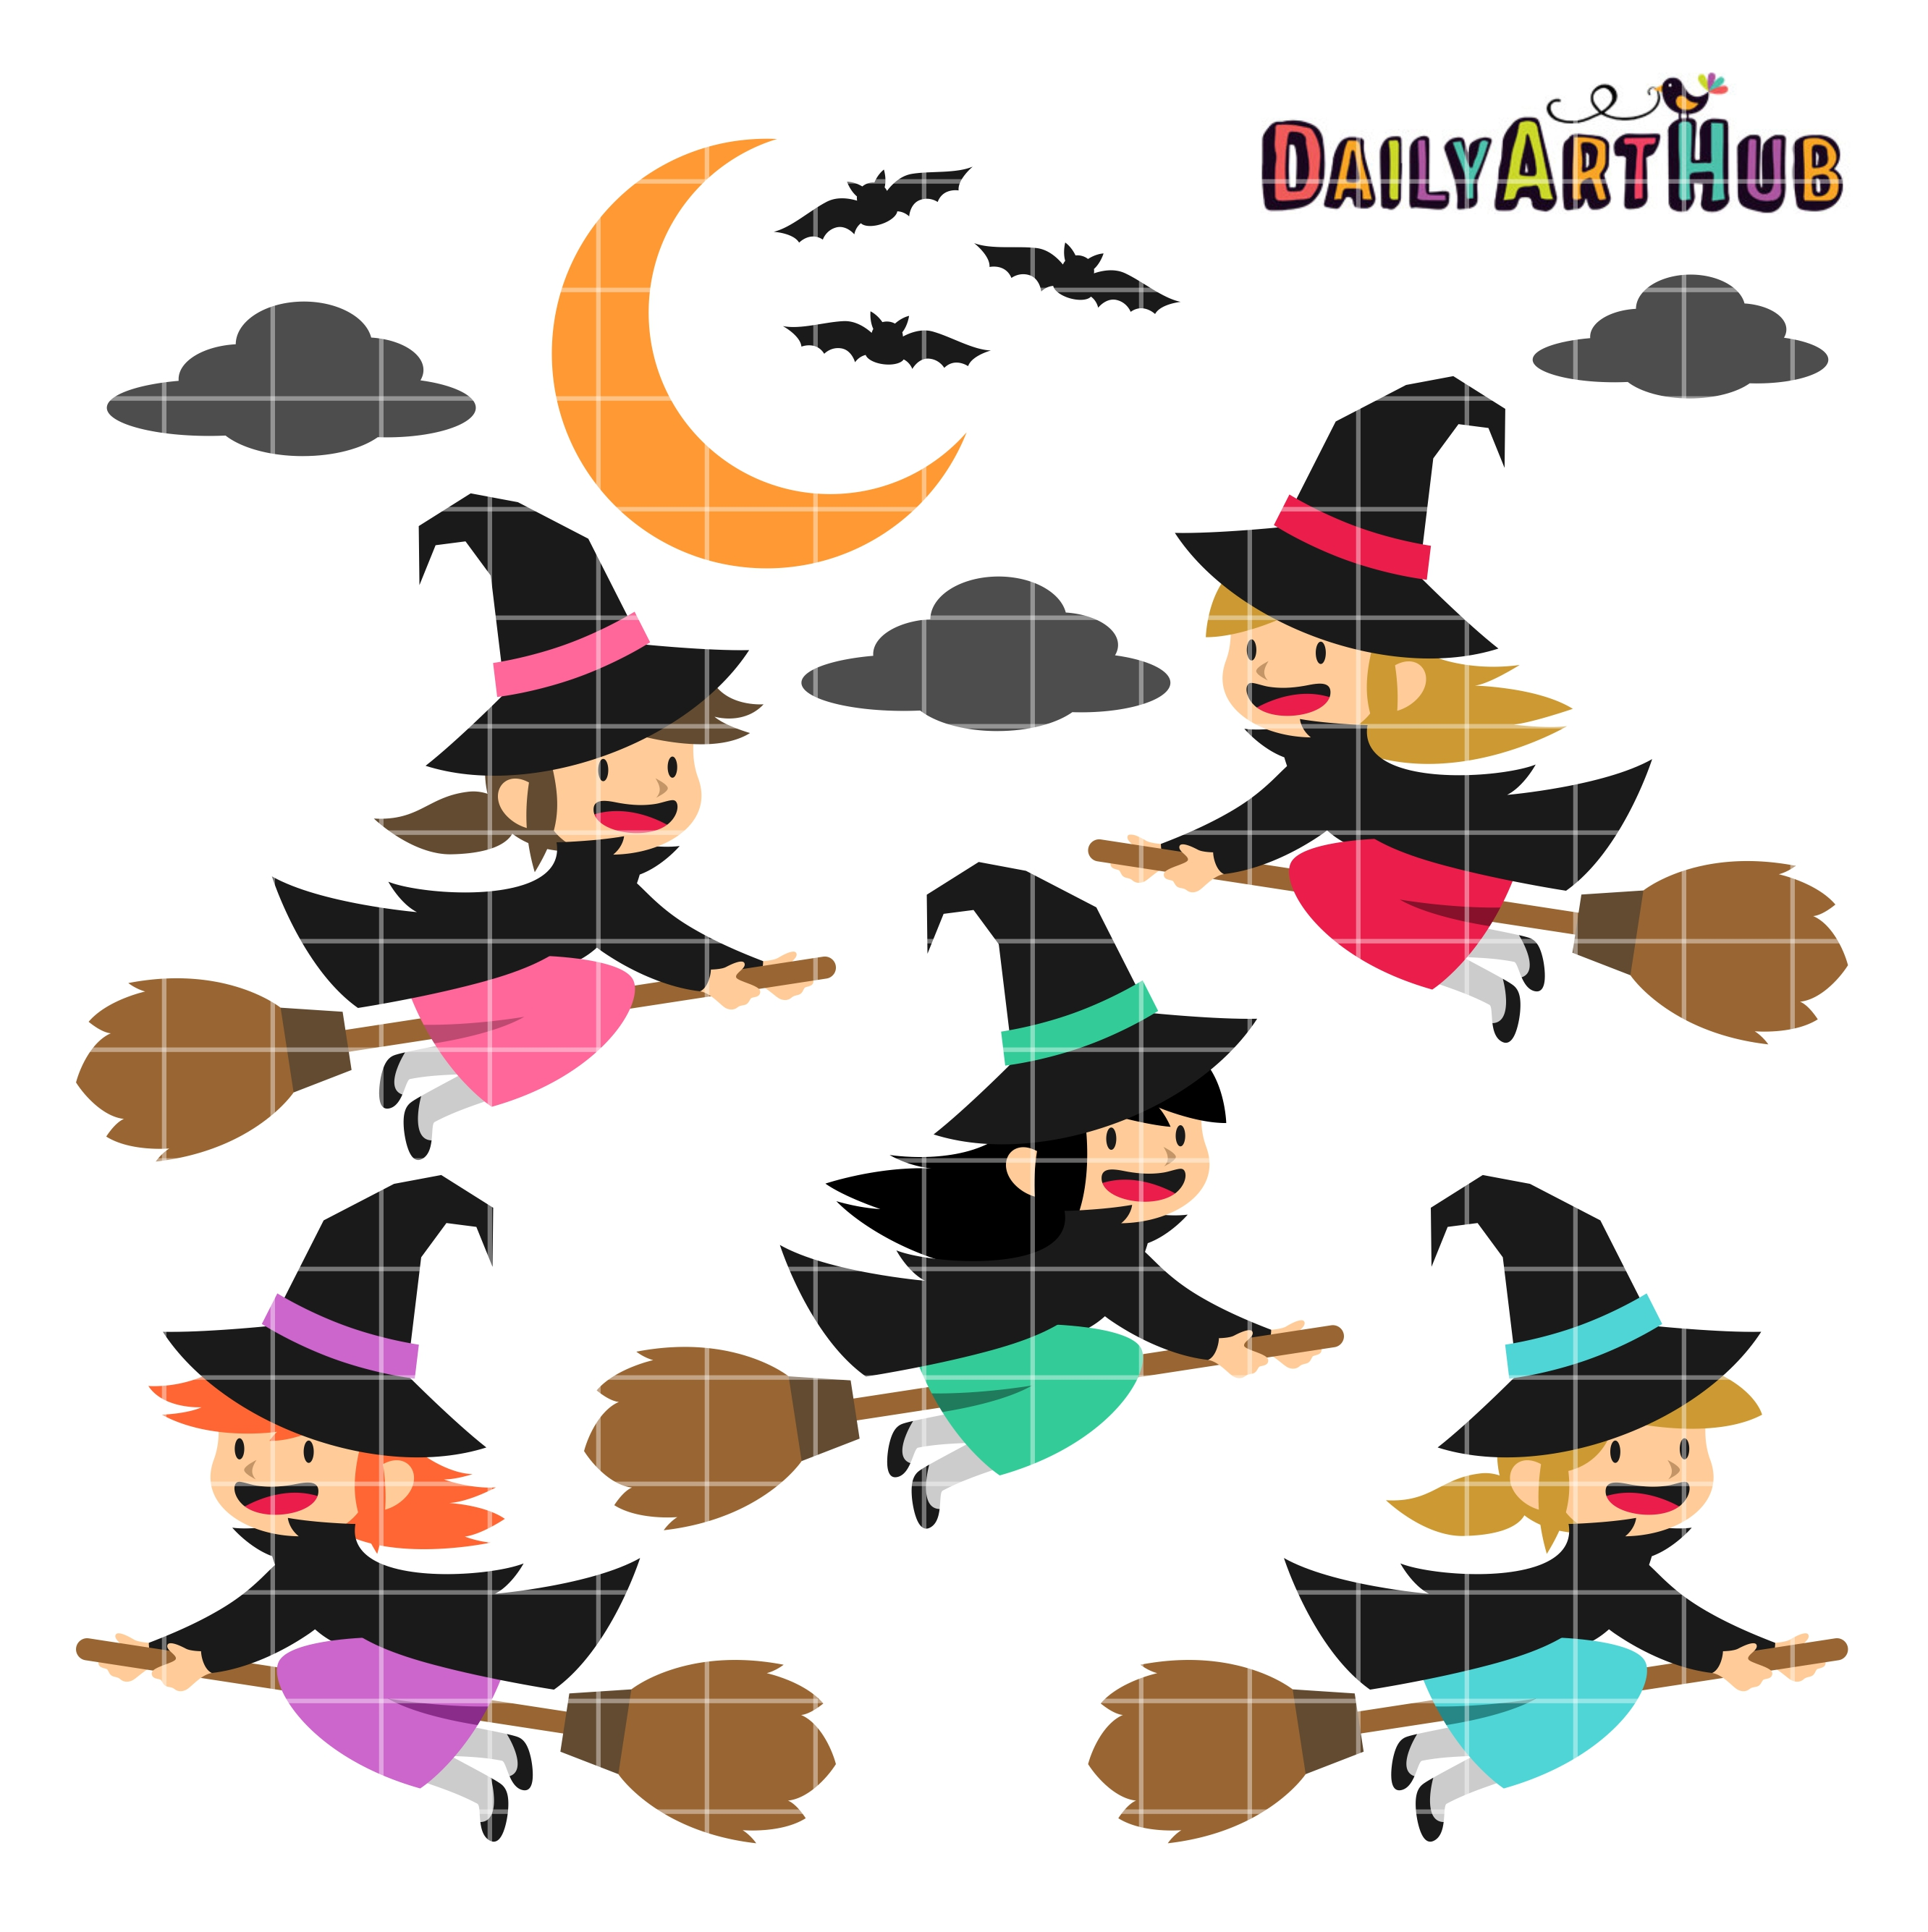 Halloween Cute Witches Clip Art Set   Daily Art Hub